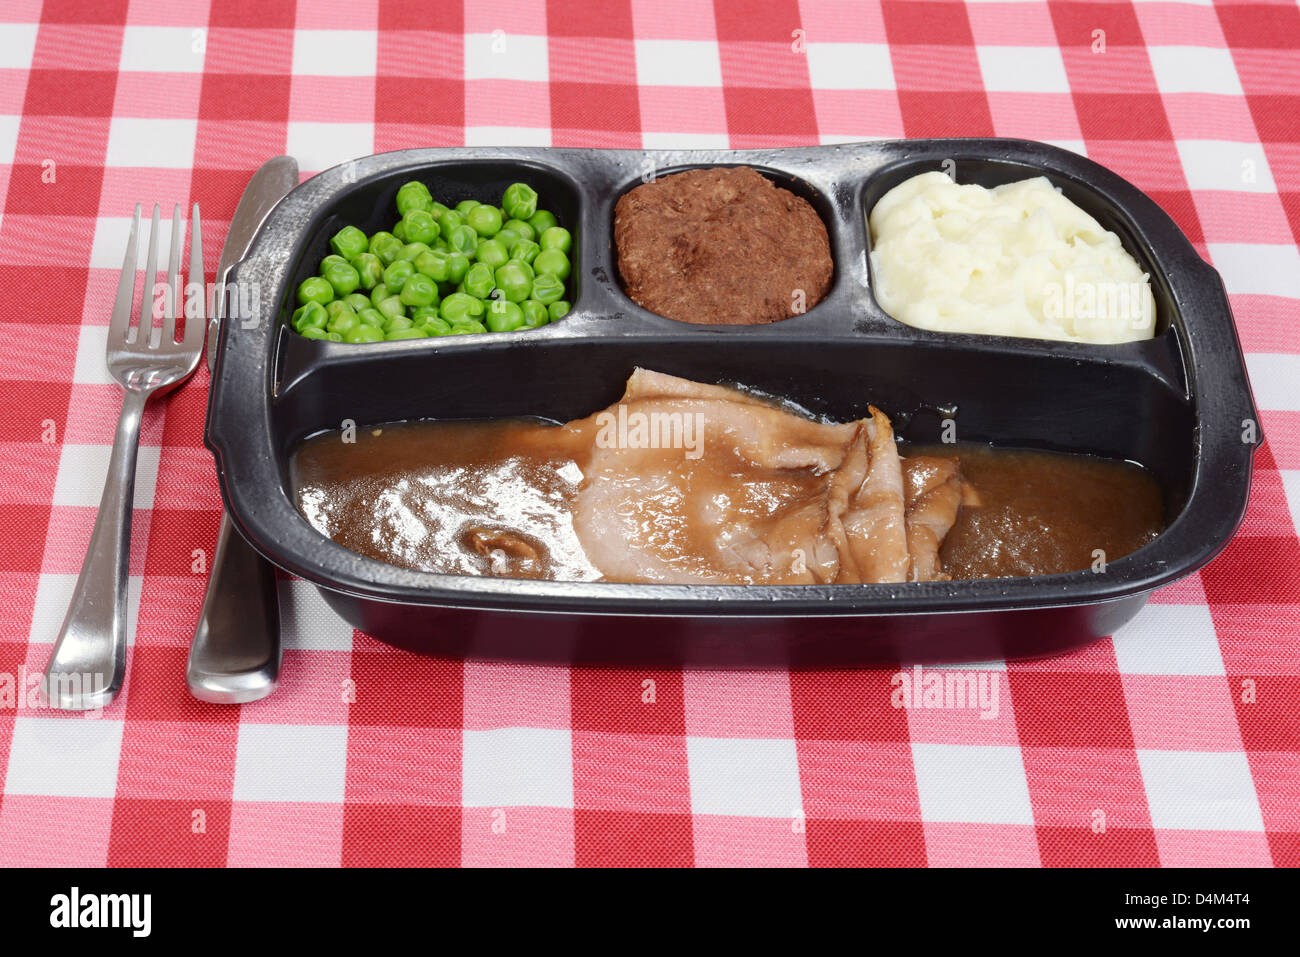 roast beef tv dinner - Stock Image